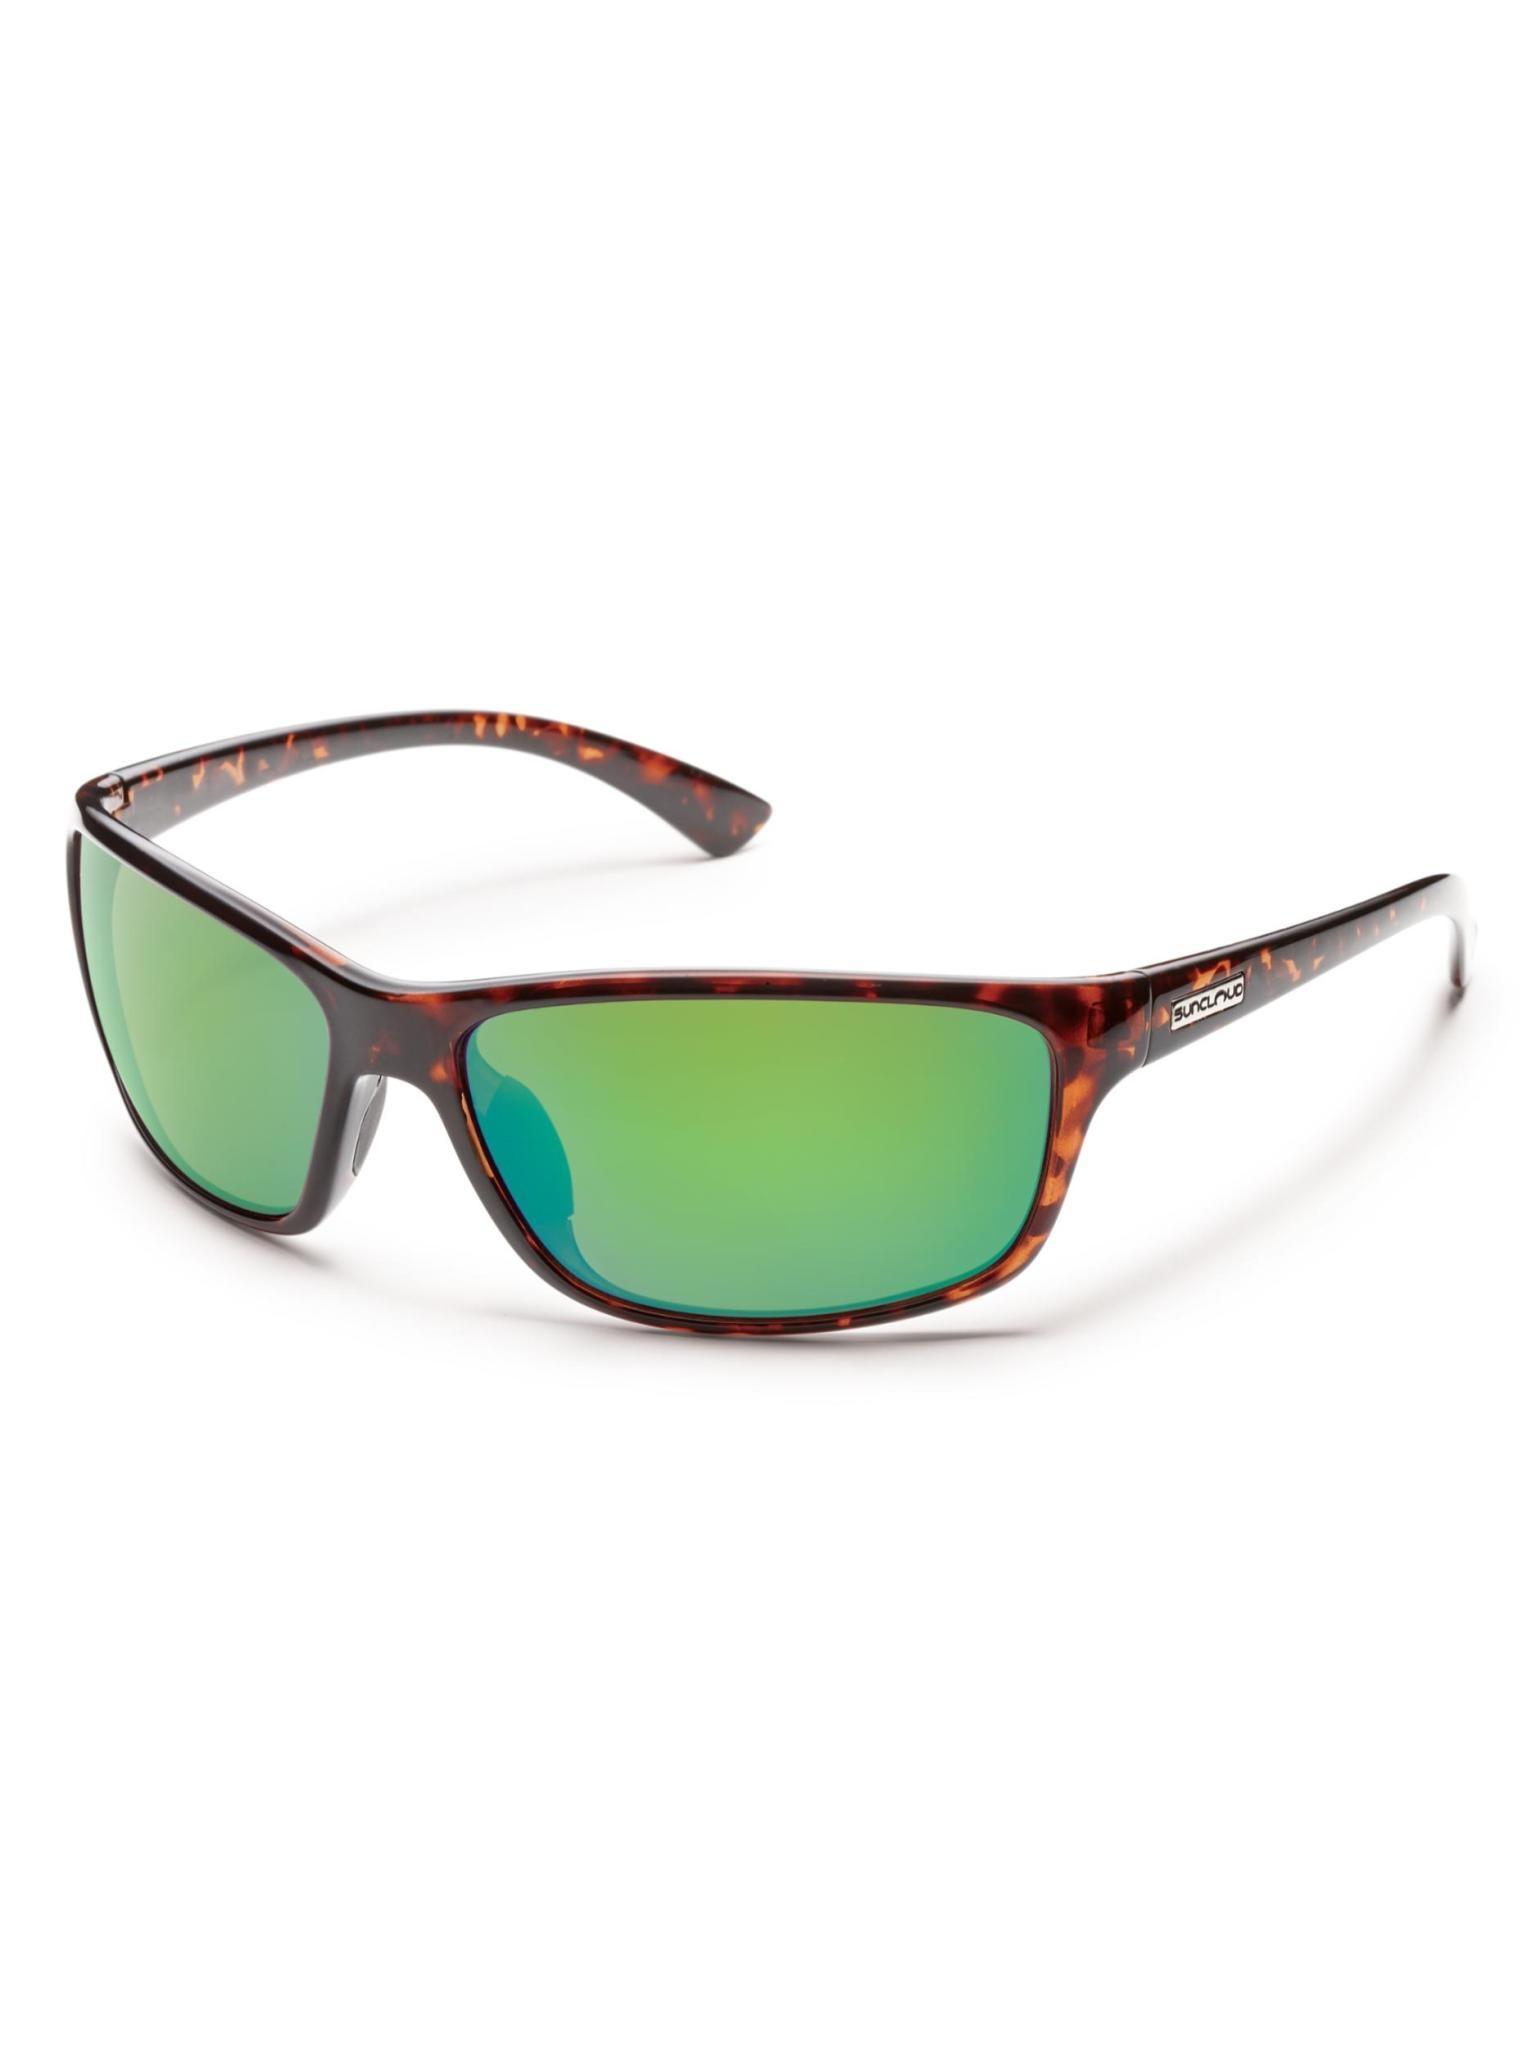 Sentry Sunglasses Tortoise Polarized Green Mirror